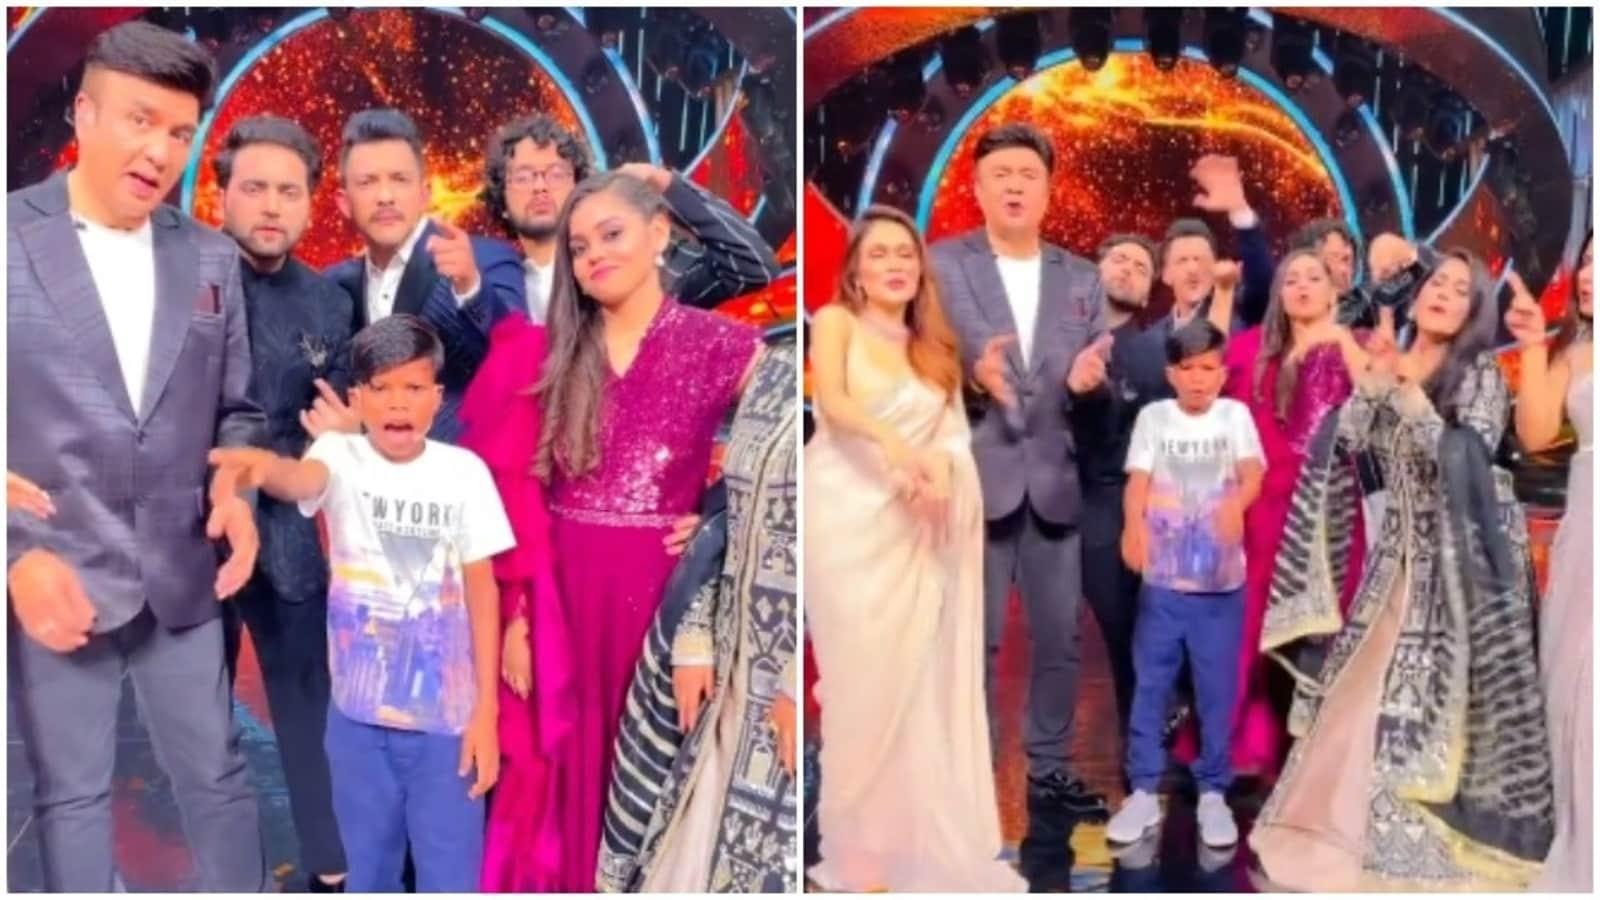 Bachpan Ka Pyaar boy performs on Indian Idol 12, Aditya Narayan-Anu Malik and contestants groove to song. Watch - Hindustan Times